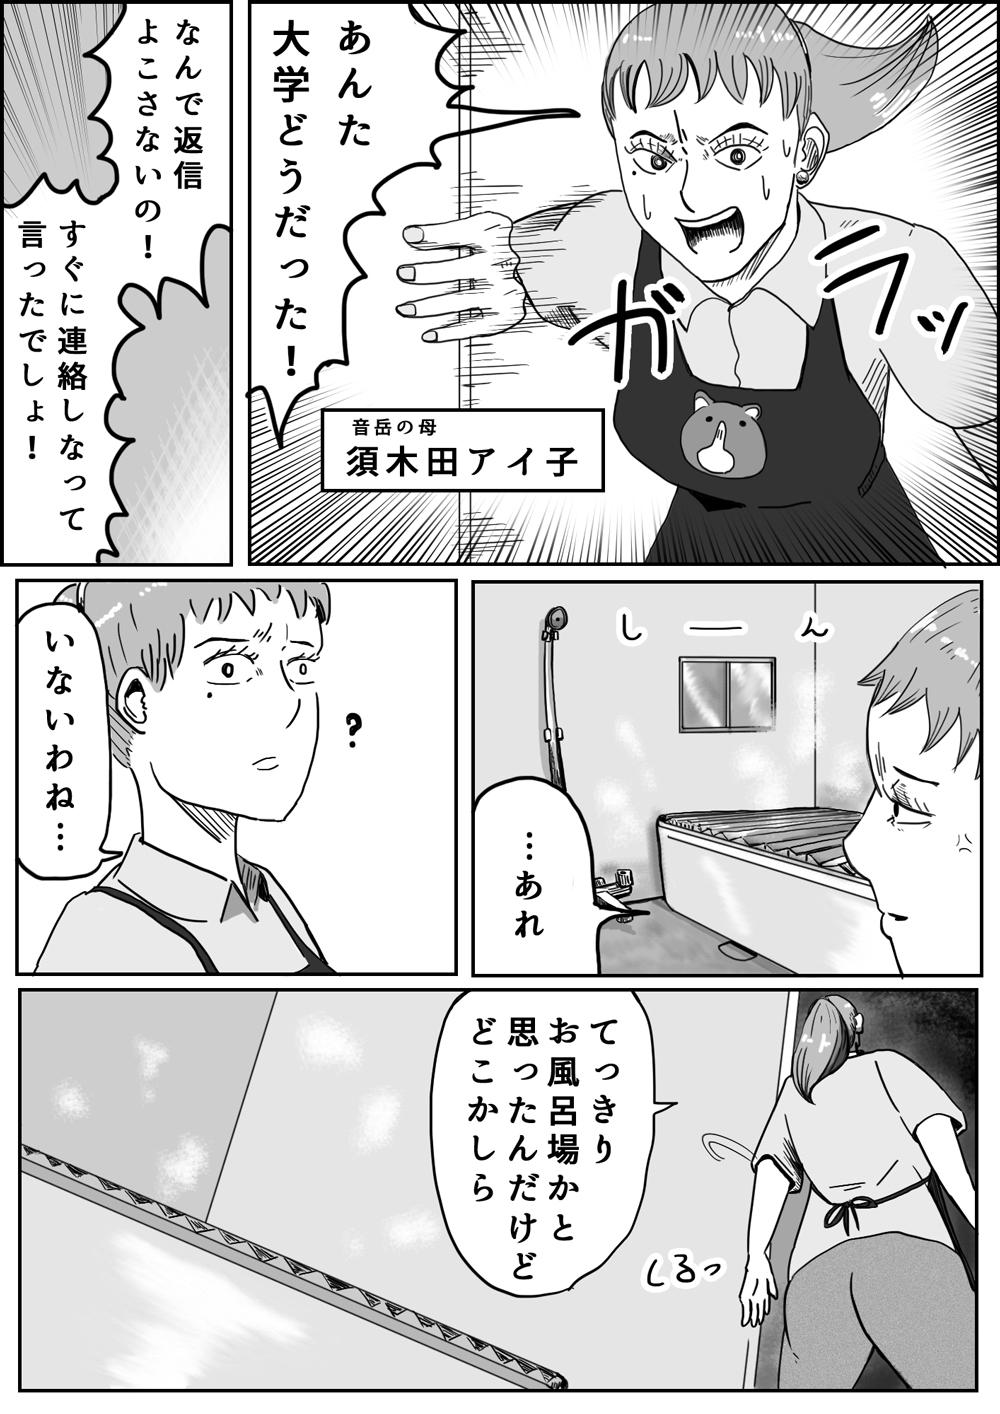 arnolds-hasegawa-003-2